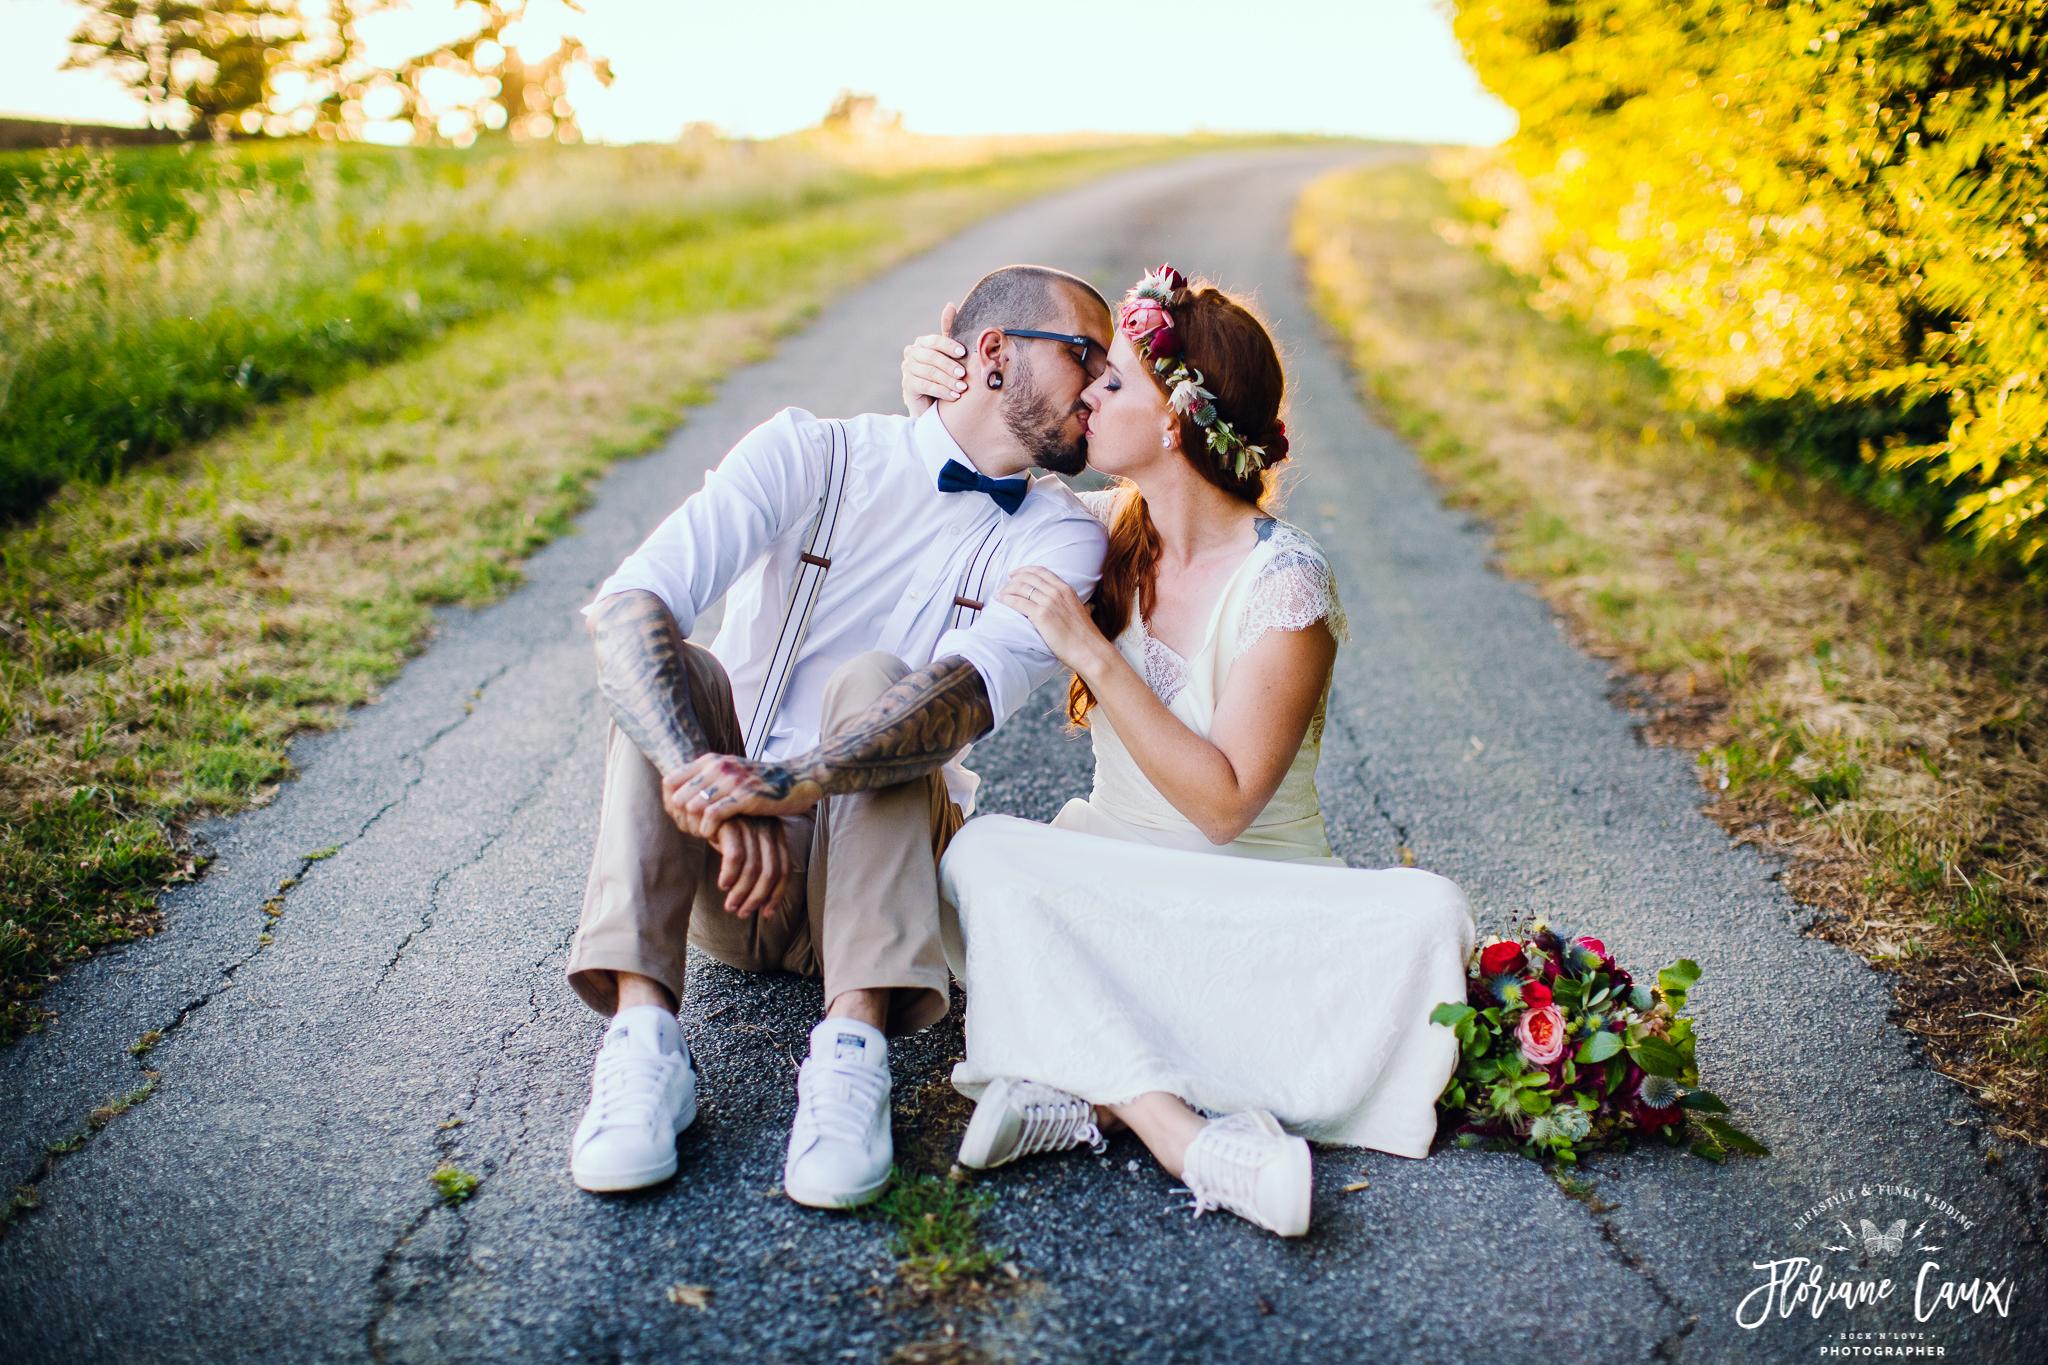 photographe-mariage-toulouse-rocknroll-maries-tatoues-floriane-caux-71